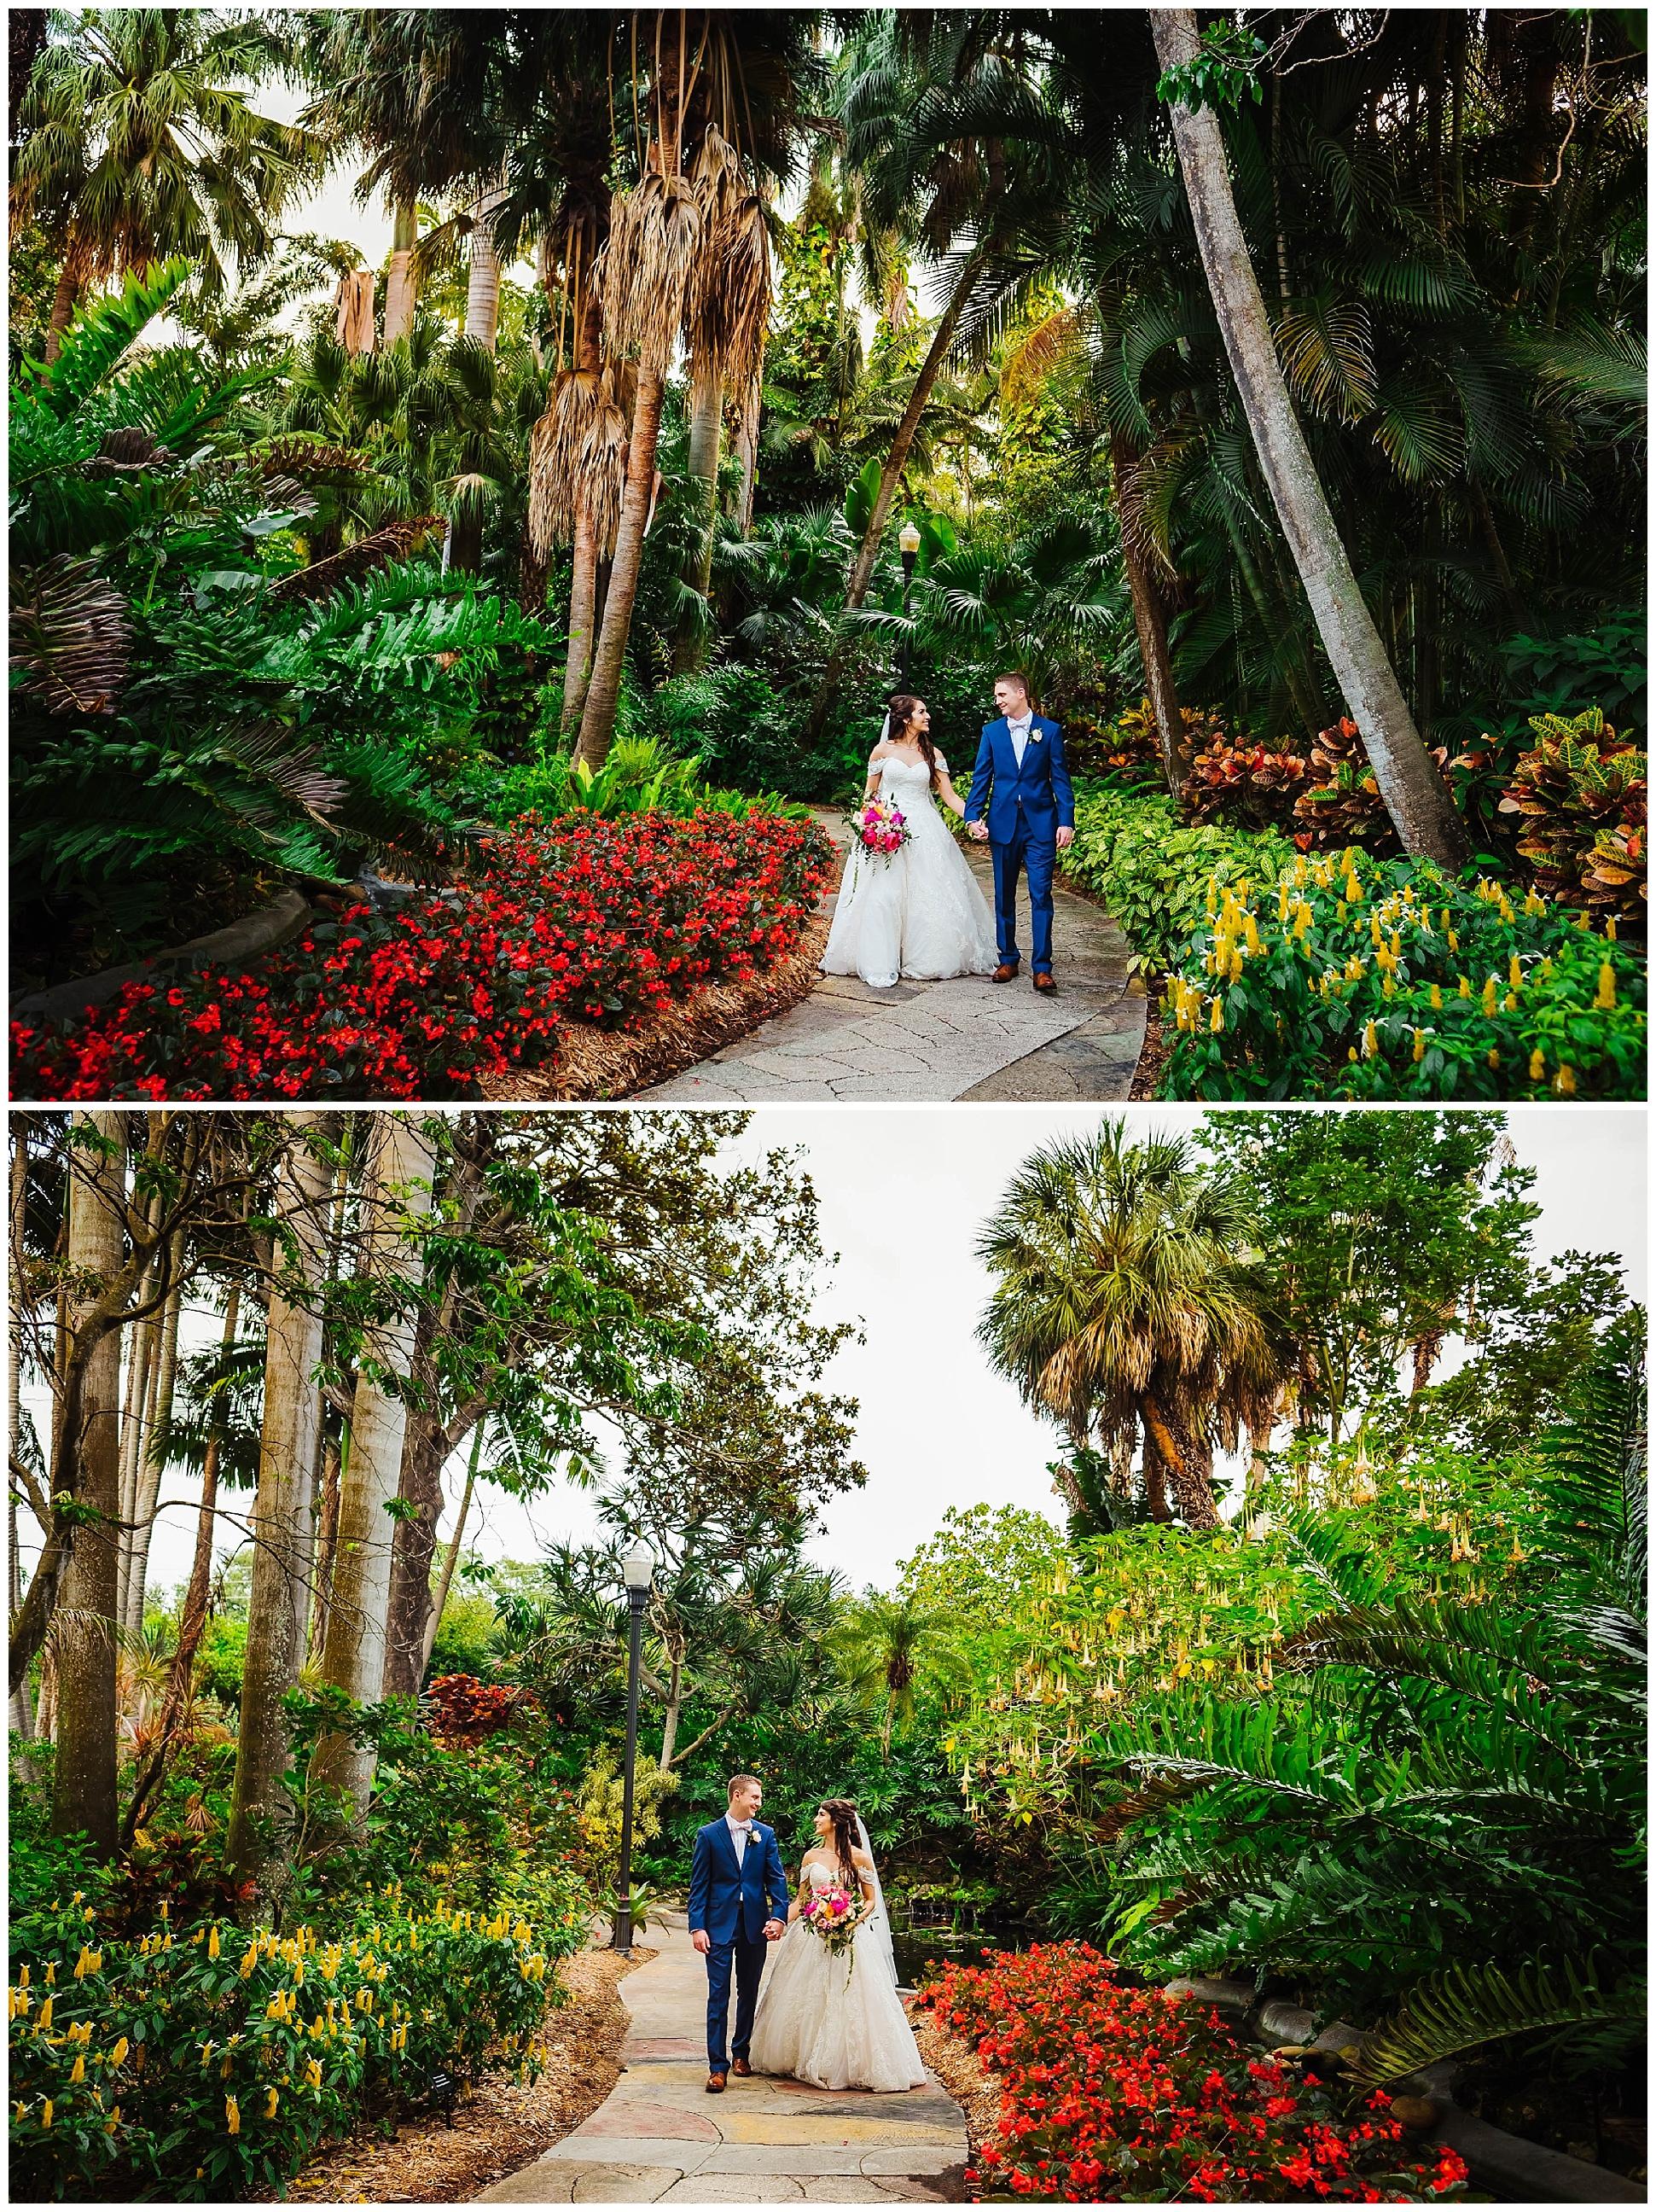 st-pete-wedding-photographer-sunken-gardens-crystal-ballroom-princess-dancer_0171.jpg